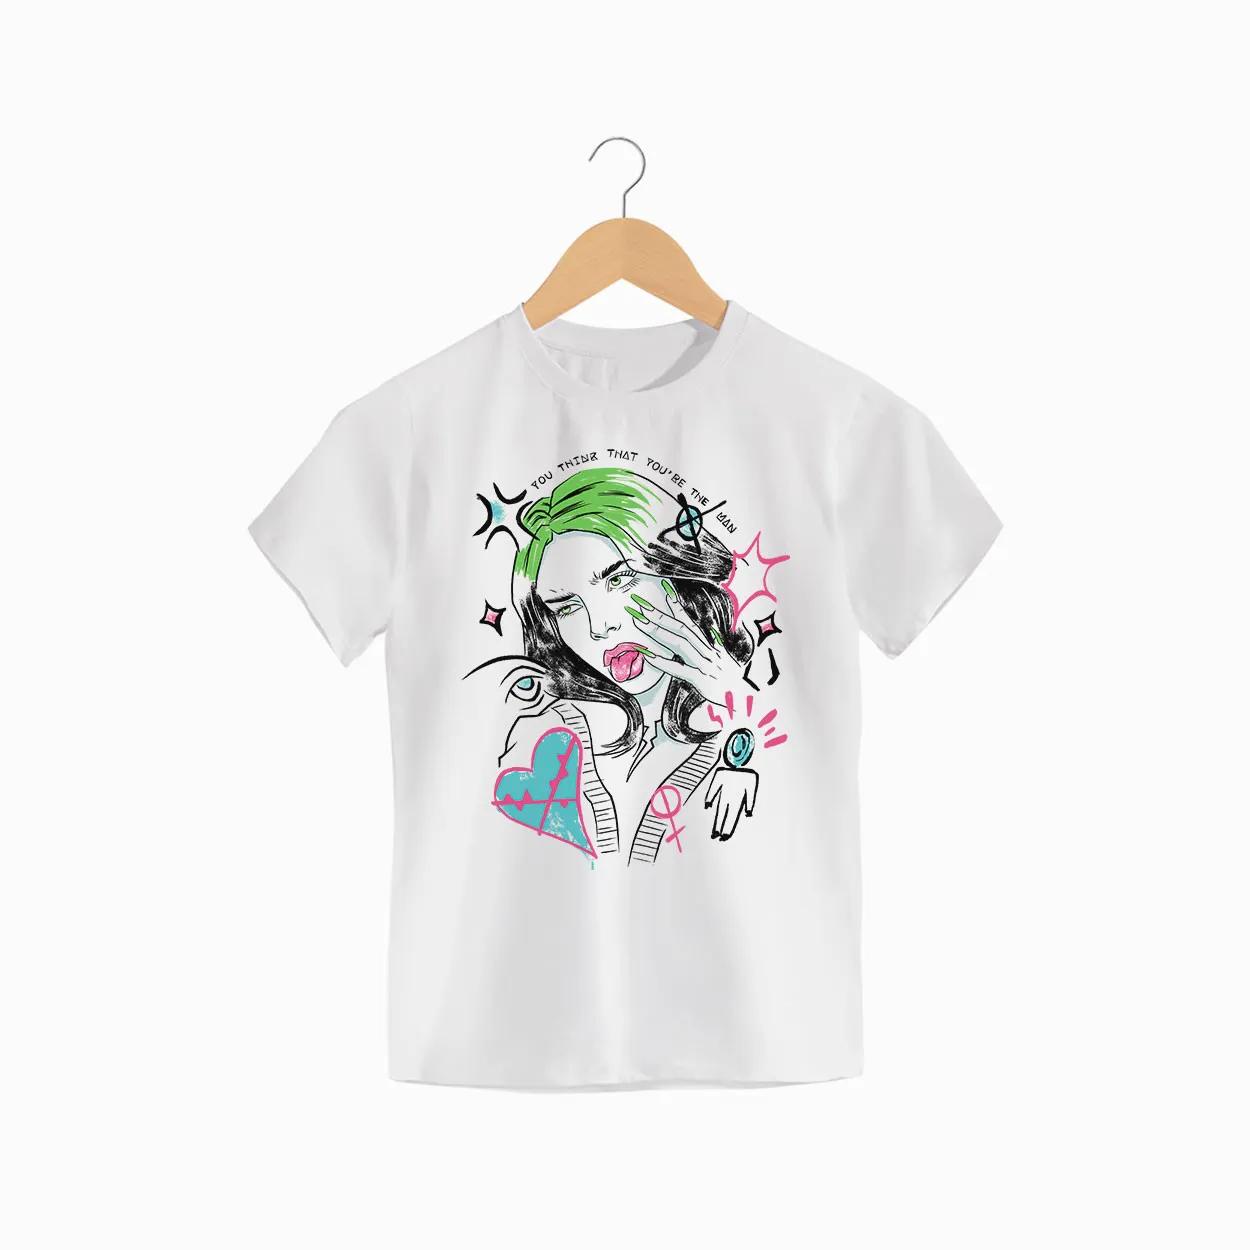 Camiseta -  Therefore I Am - Billie Eilish - Infantil